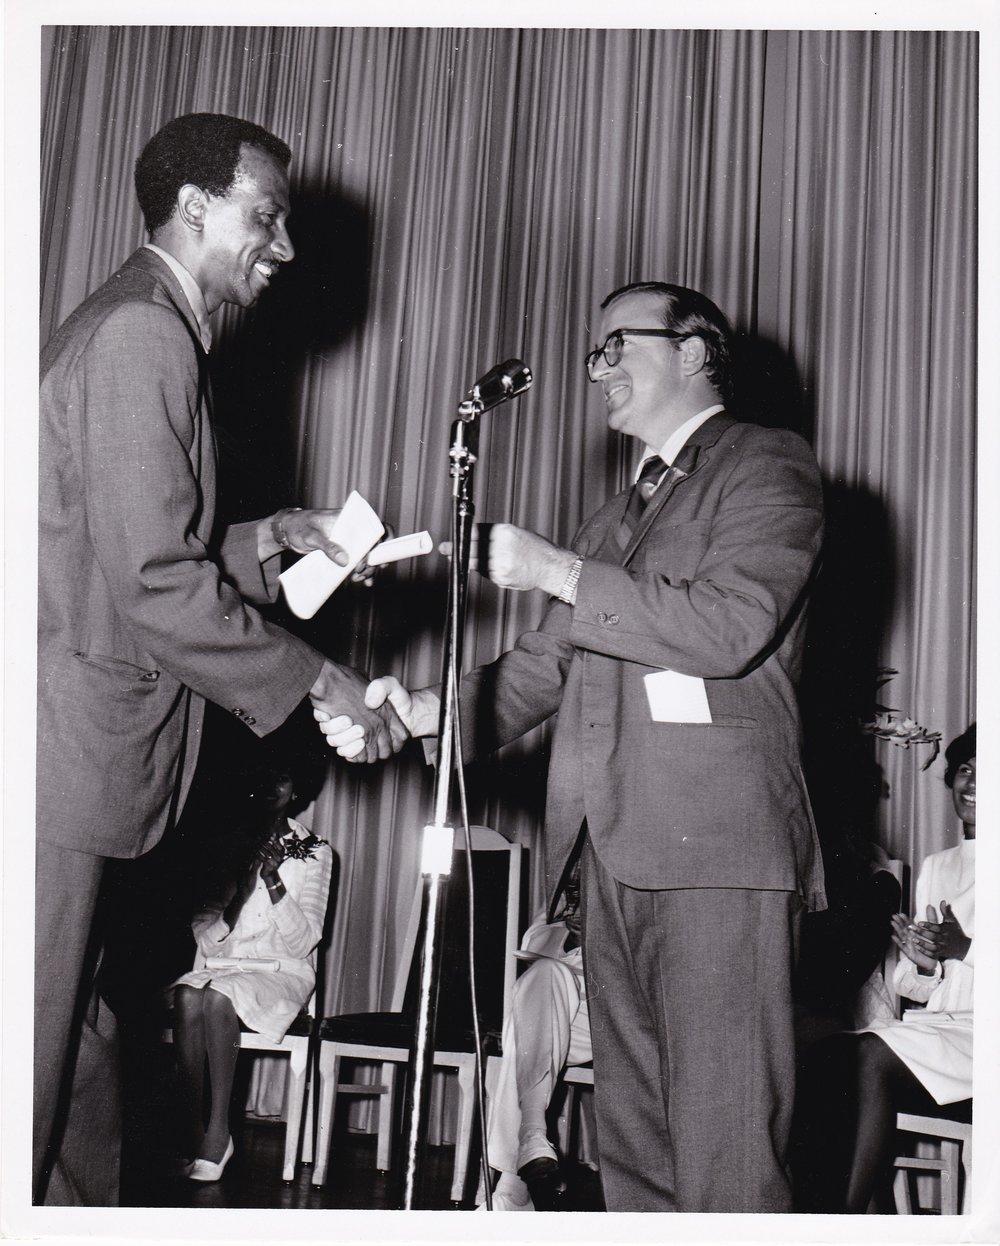 #7: '69 _____ and Timothy Gibbons at Graduation